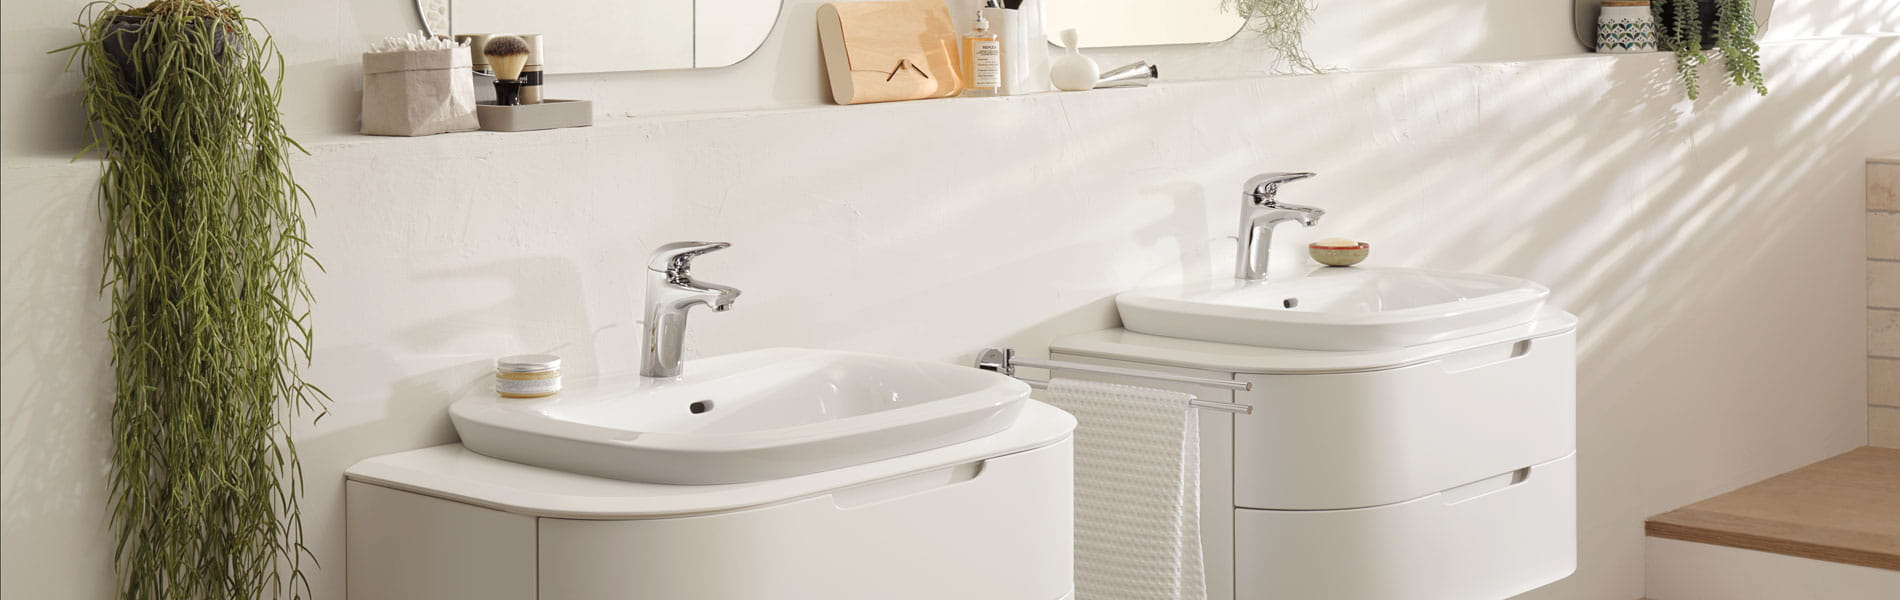 Eurostyle Bathroom Faucet